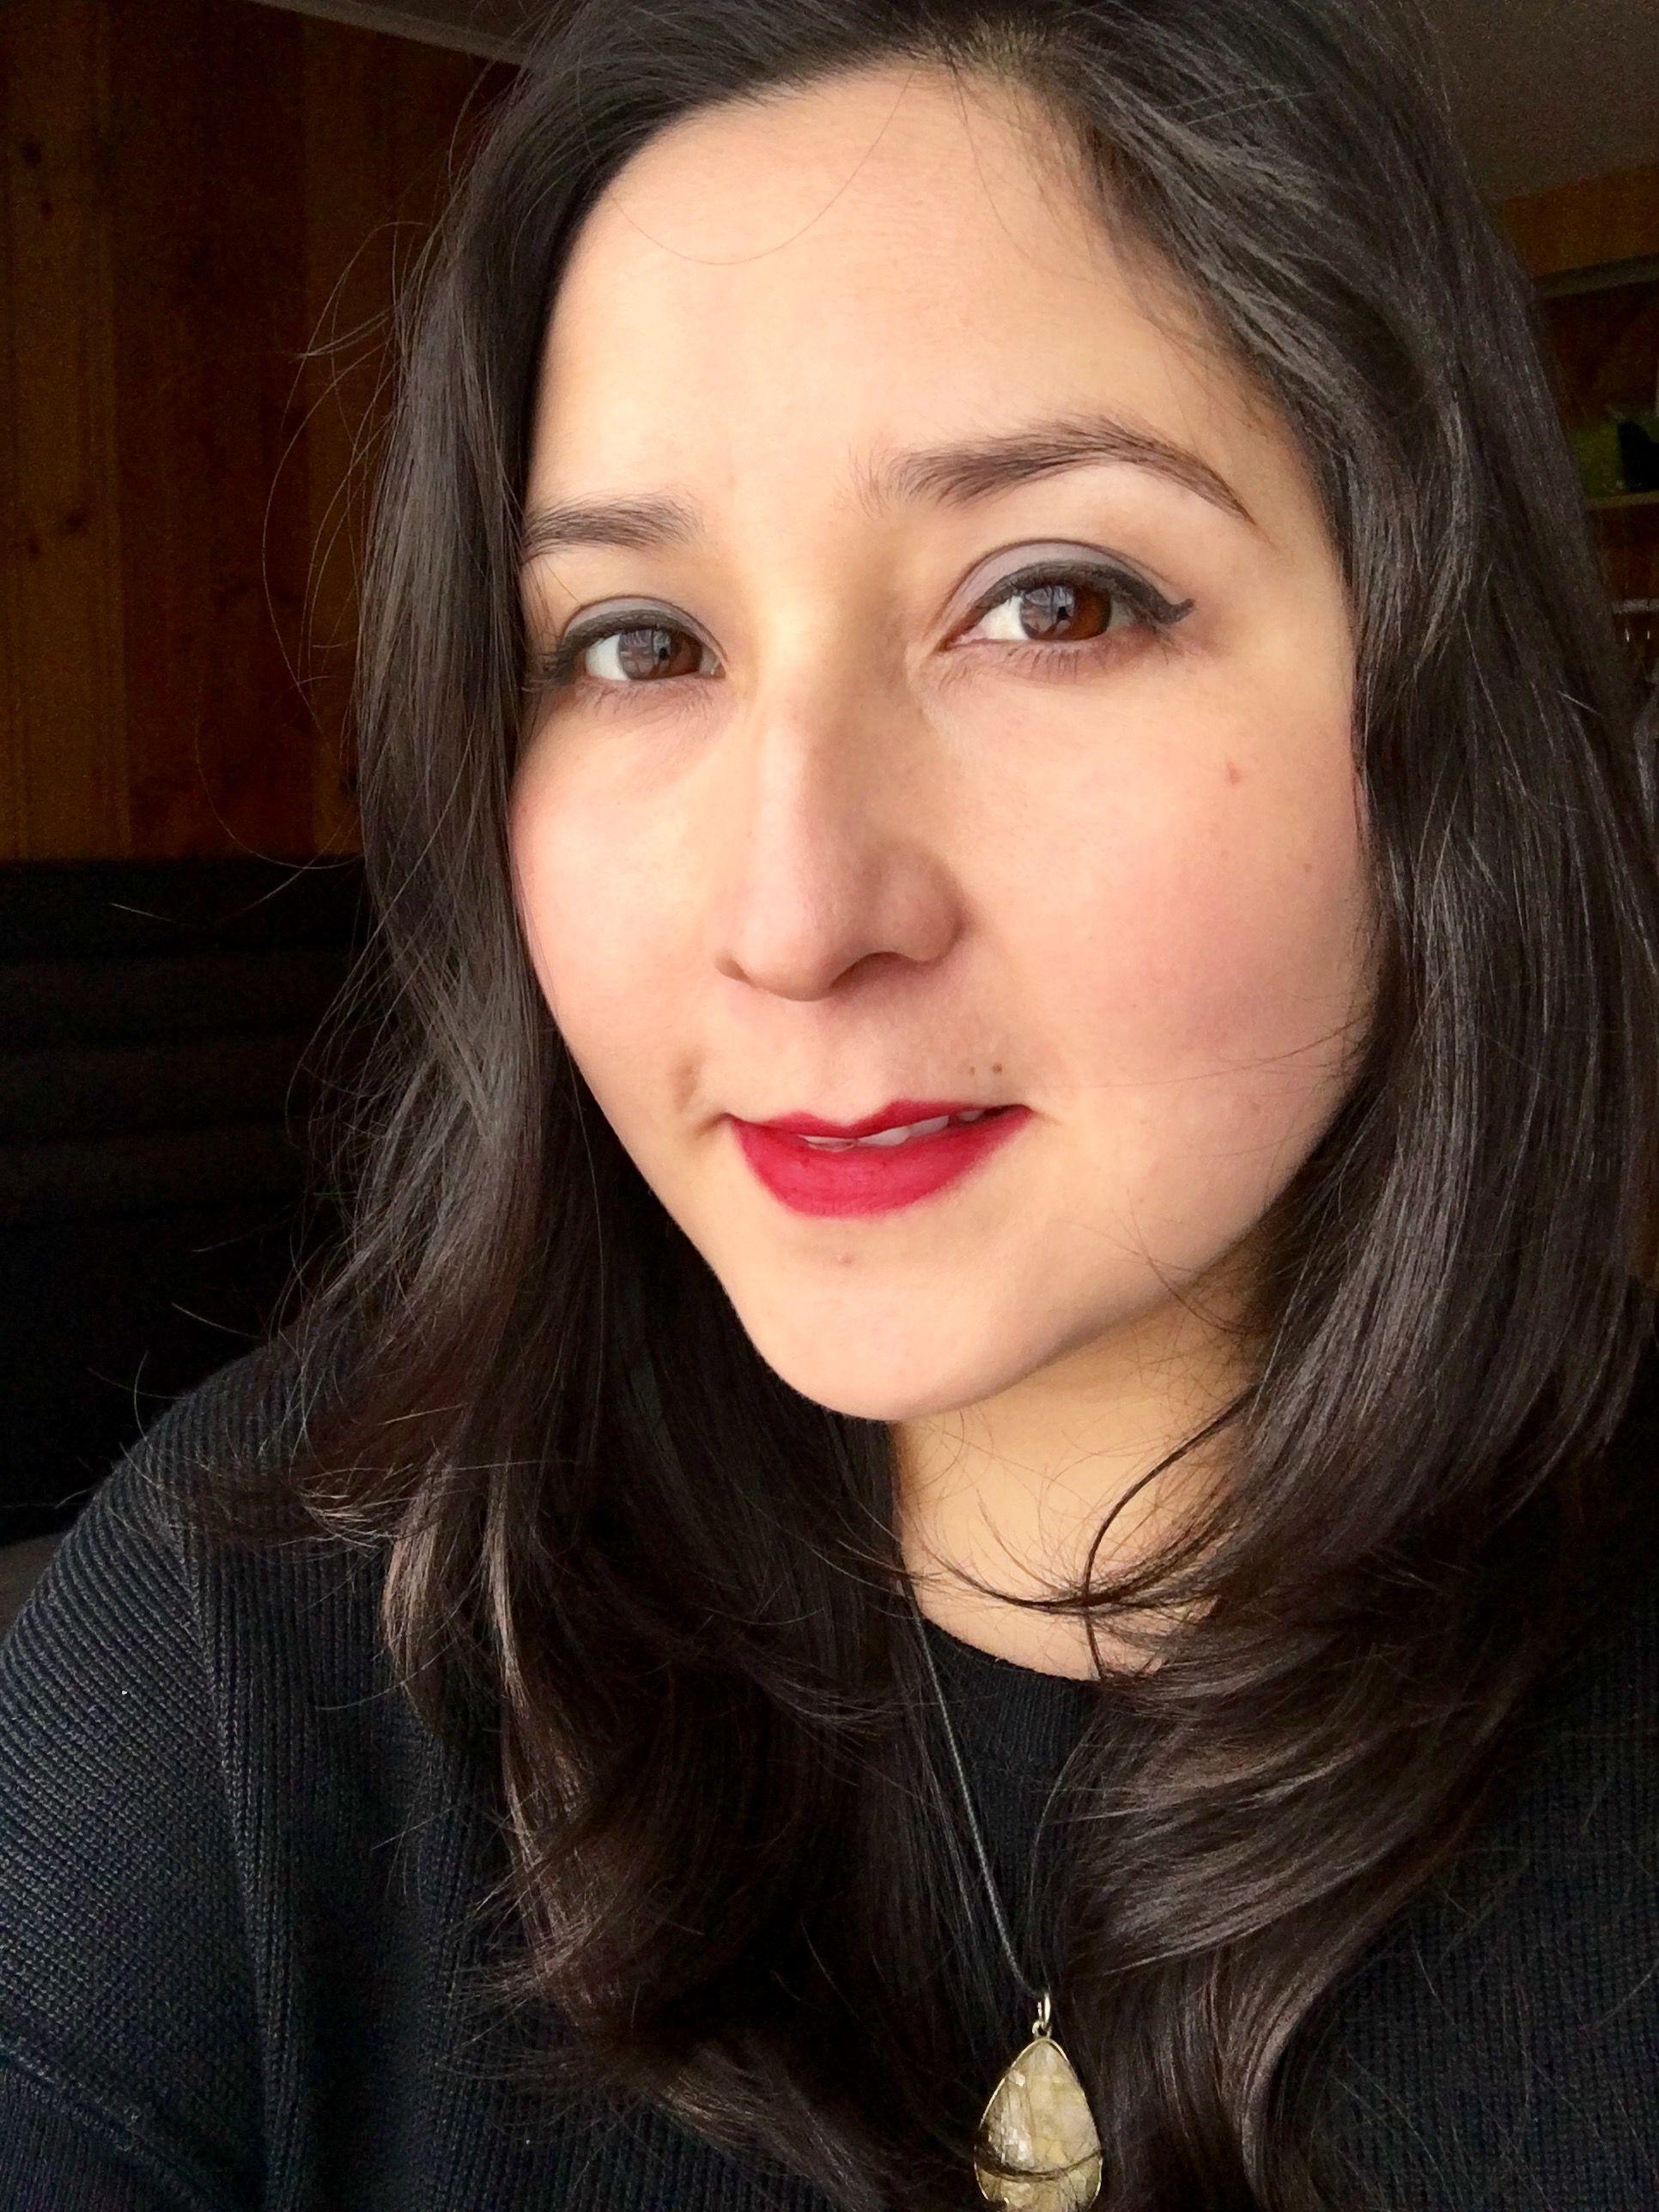 Makeup Pin-up girl by snowWwflake on DeviantArt